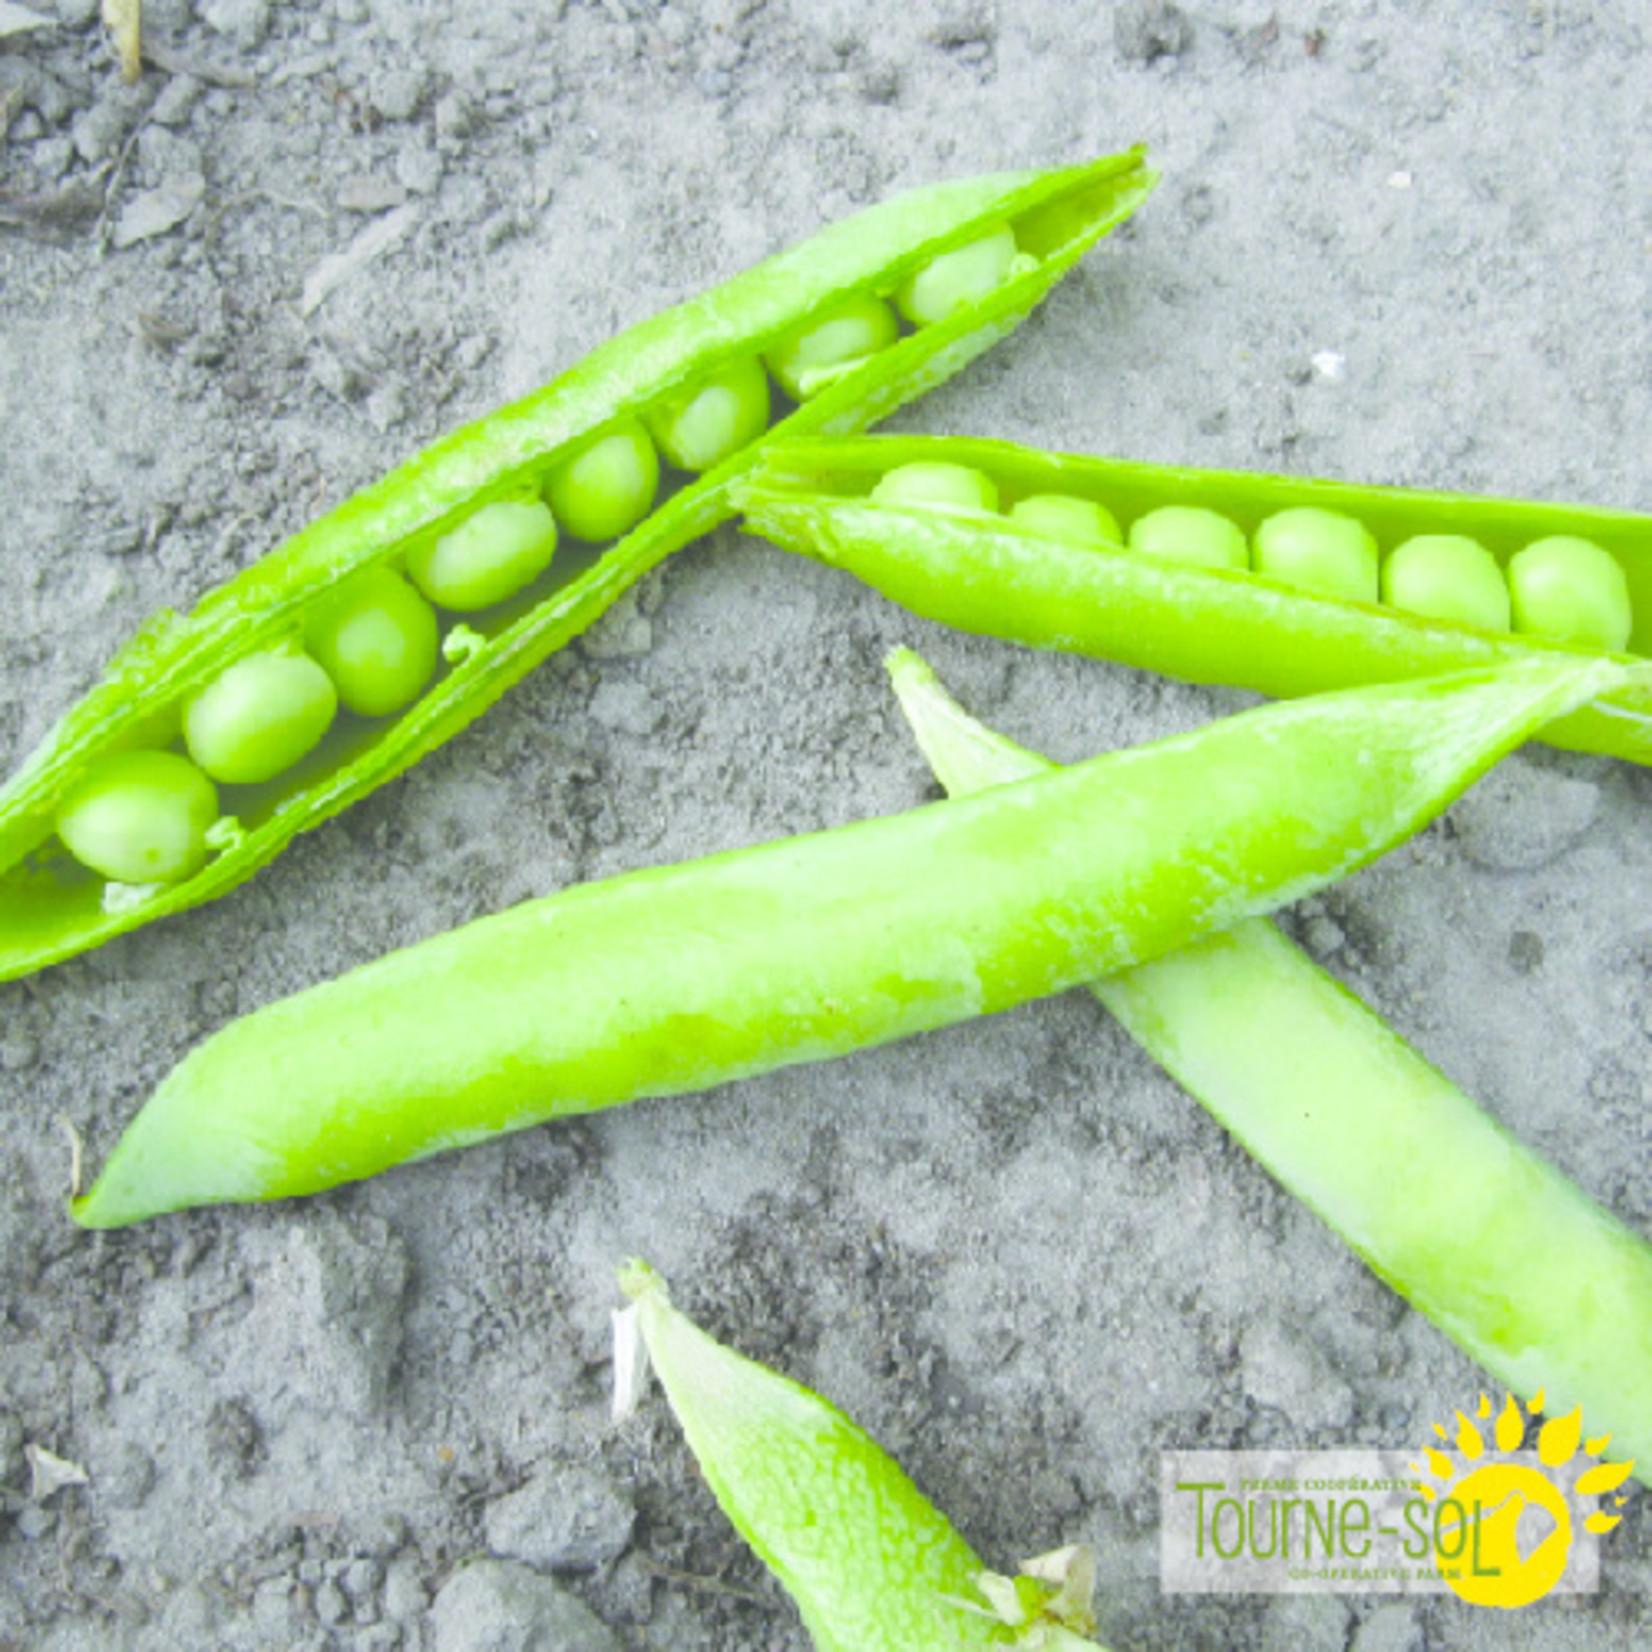 Tourne-Sol Green Arrow shelling pea